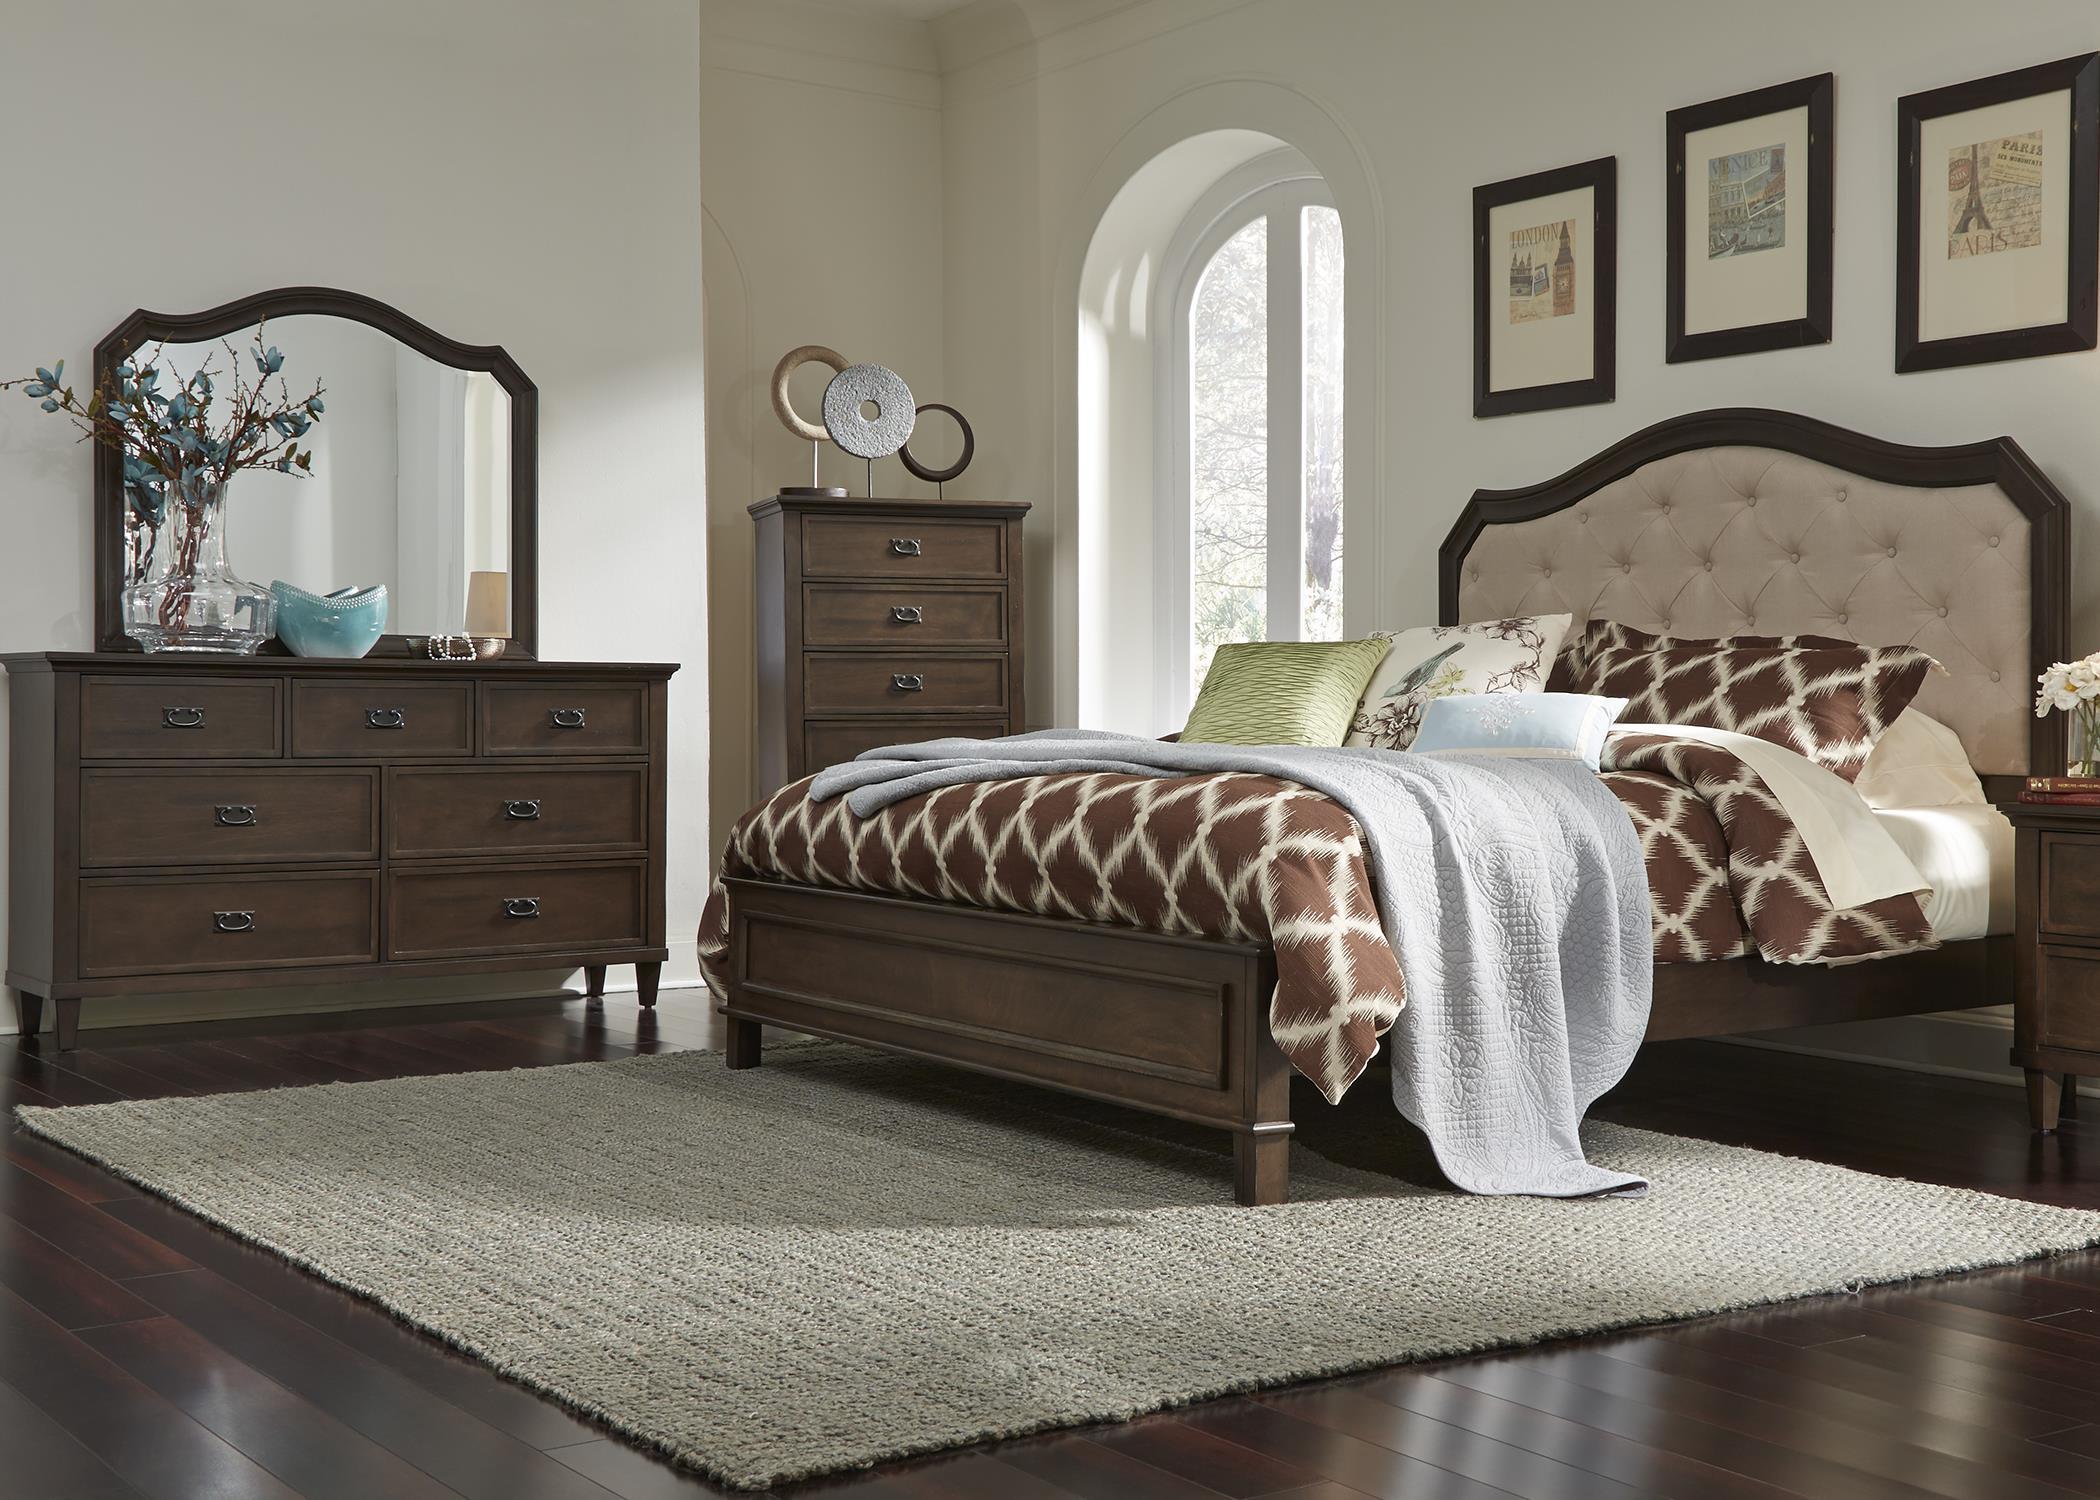 Liberty Furniture Berkley Heights King Bedroom Group - Item Number: 102 K Bedroom Group 2